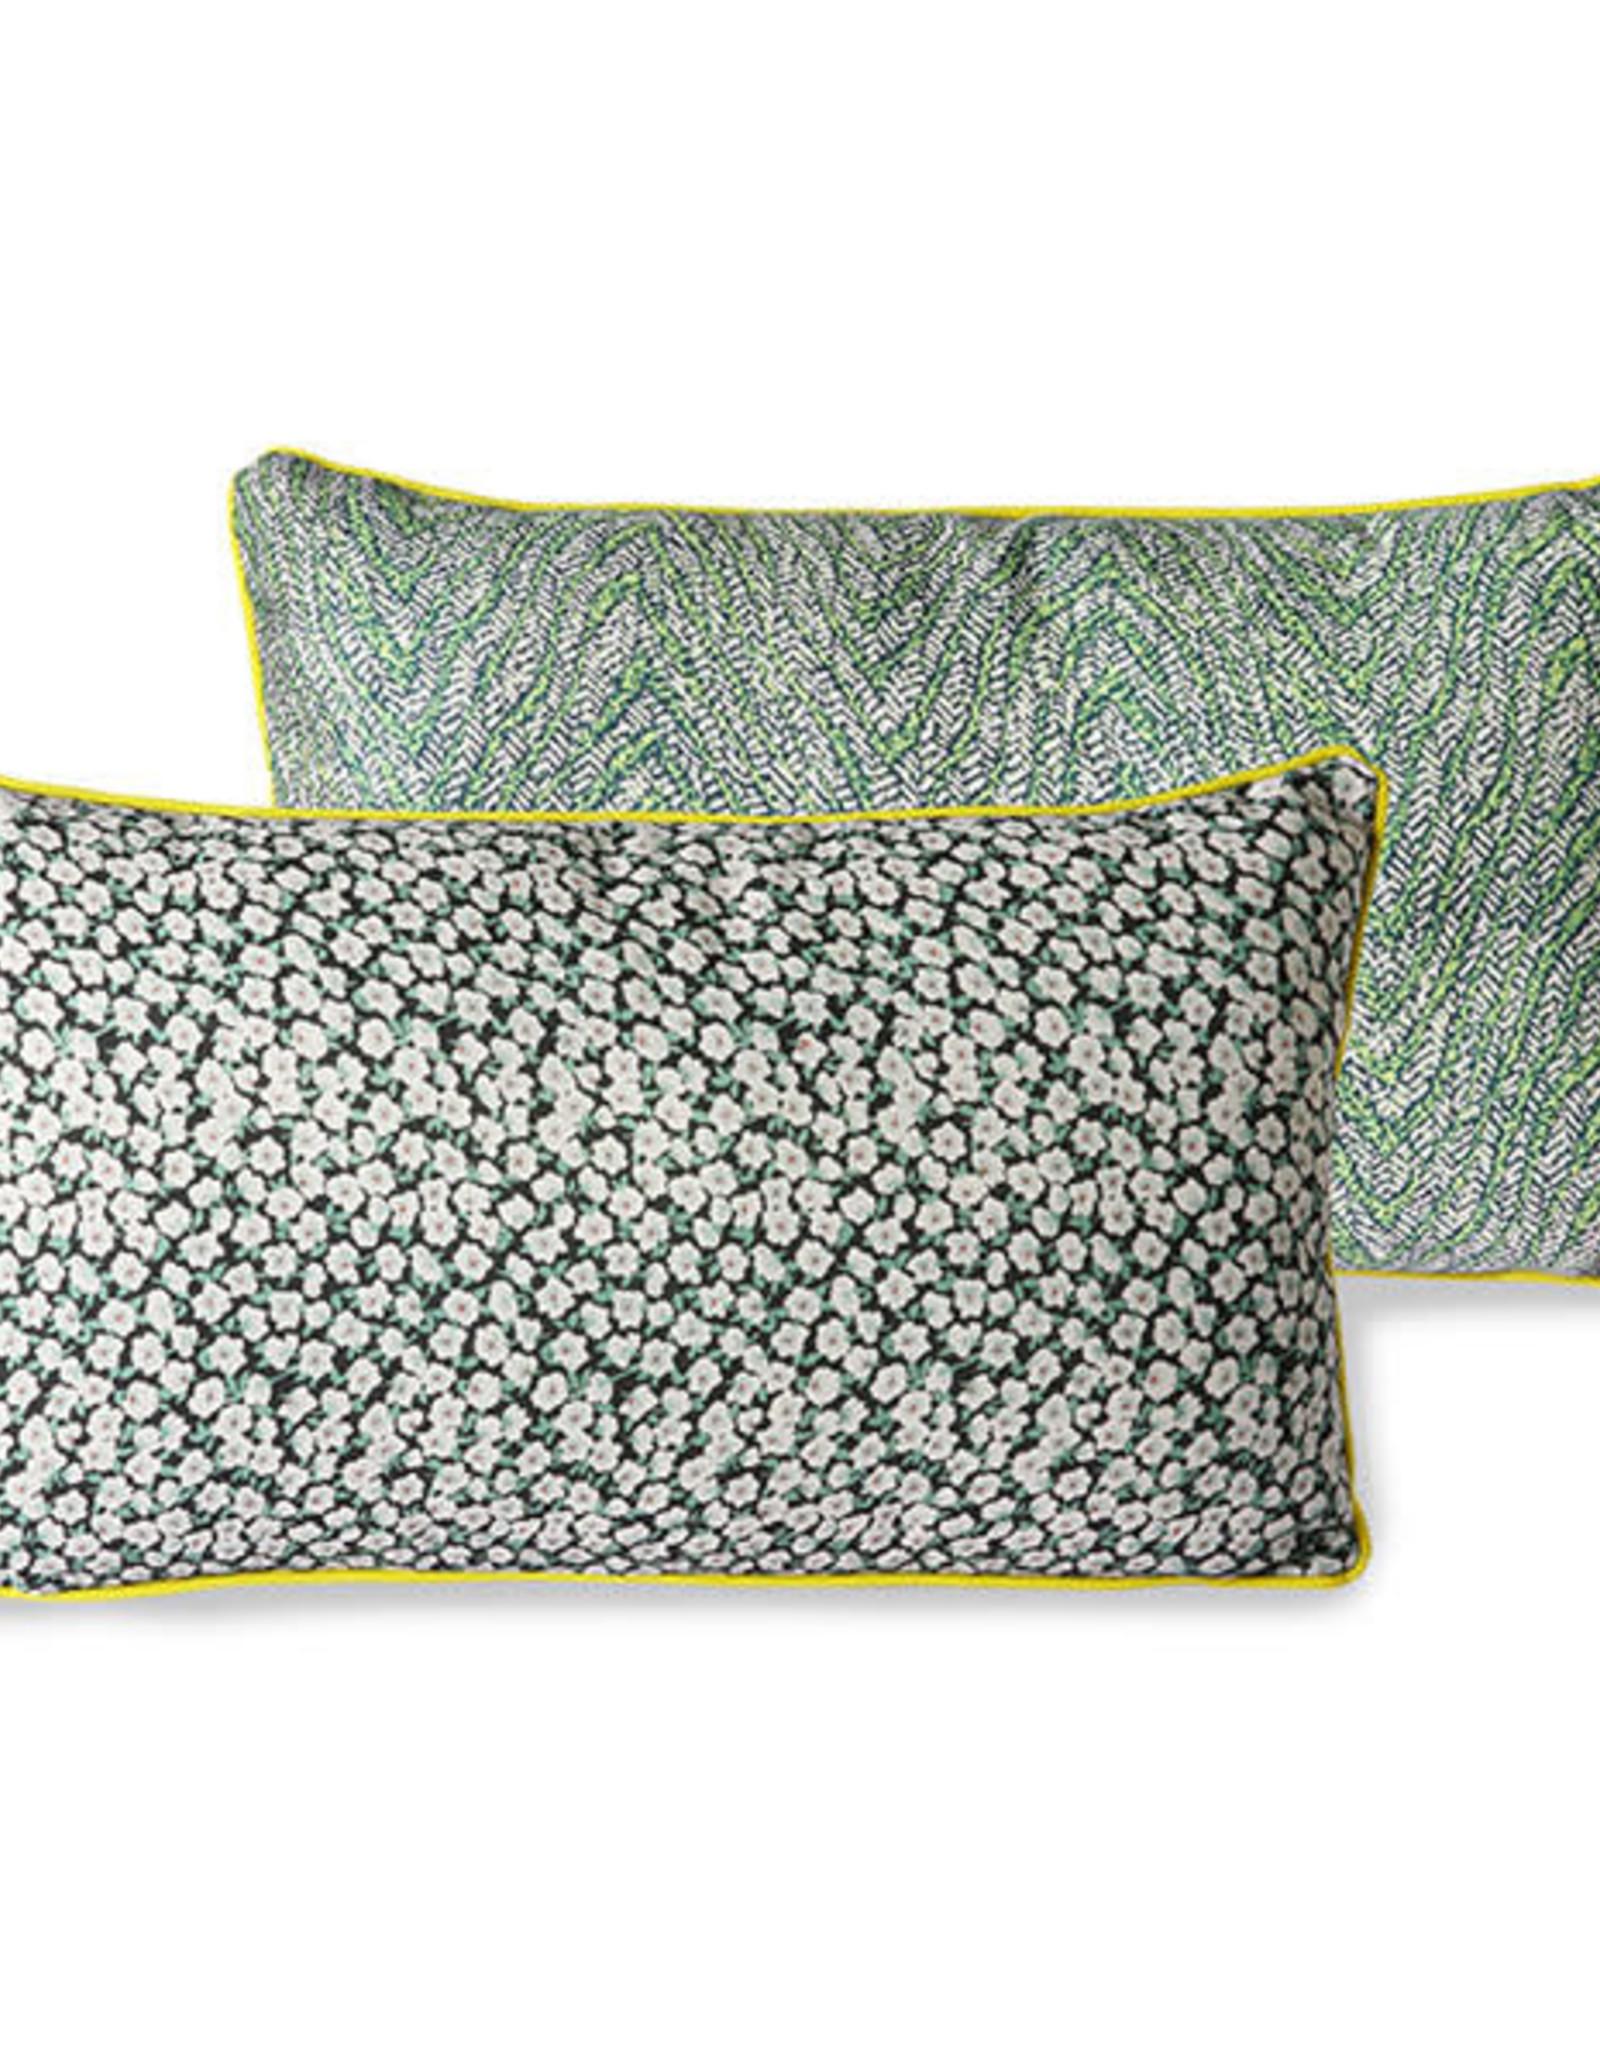 HKliving Doris for HK Living printed cushion green 35x60cm